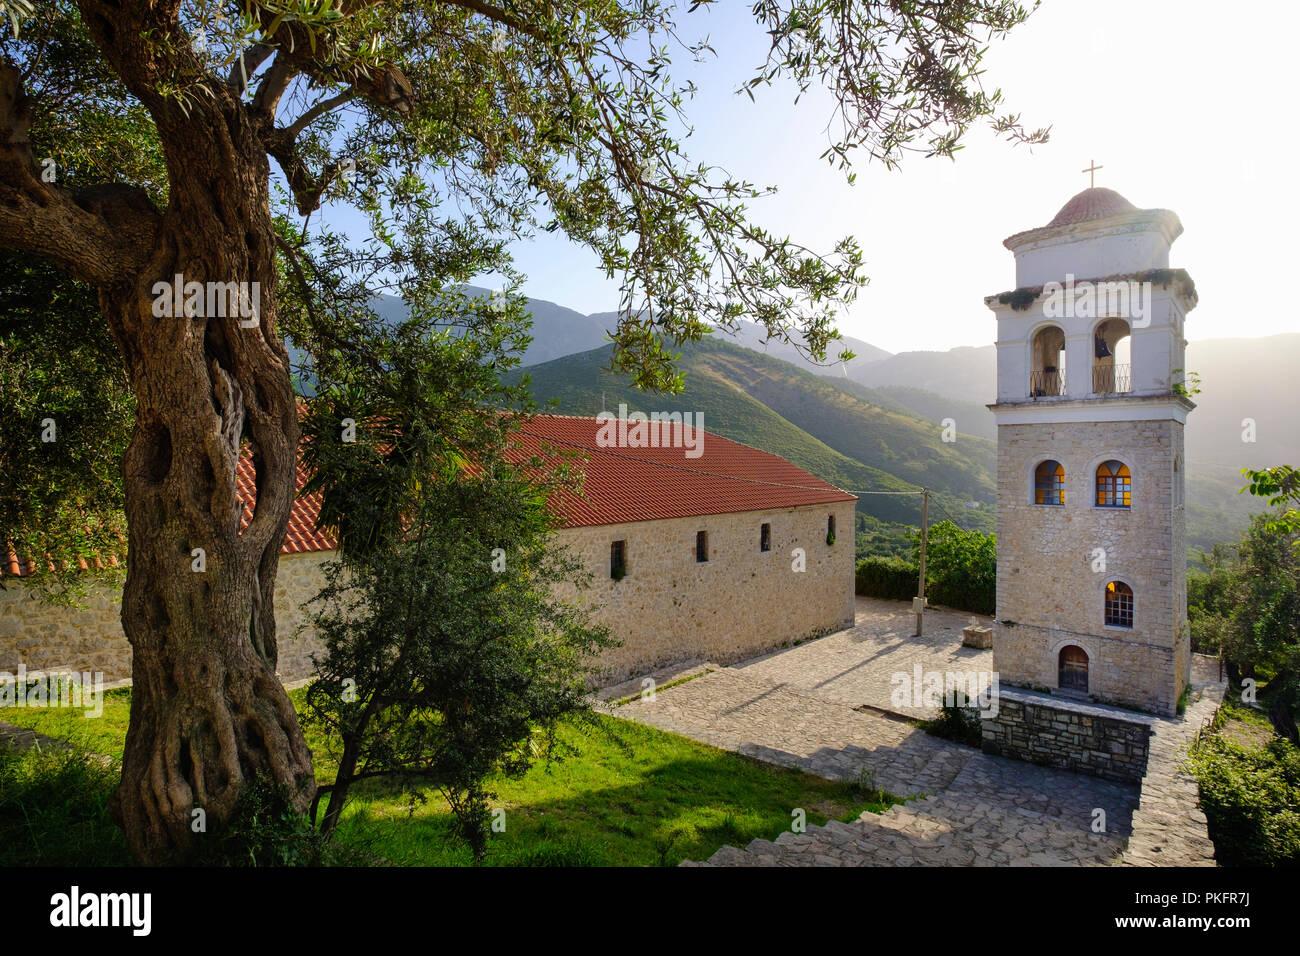 Orthodox All Saints church with belfry, ancient mountain village Himara, Himarë, Qark Vlora, Albania - Stock Image